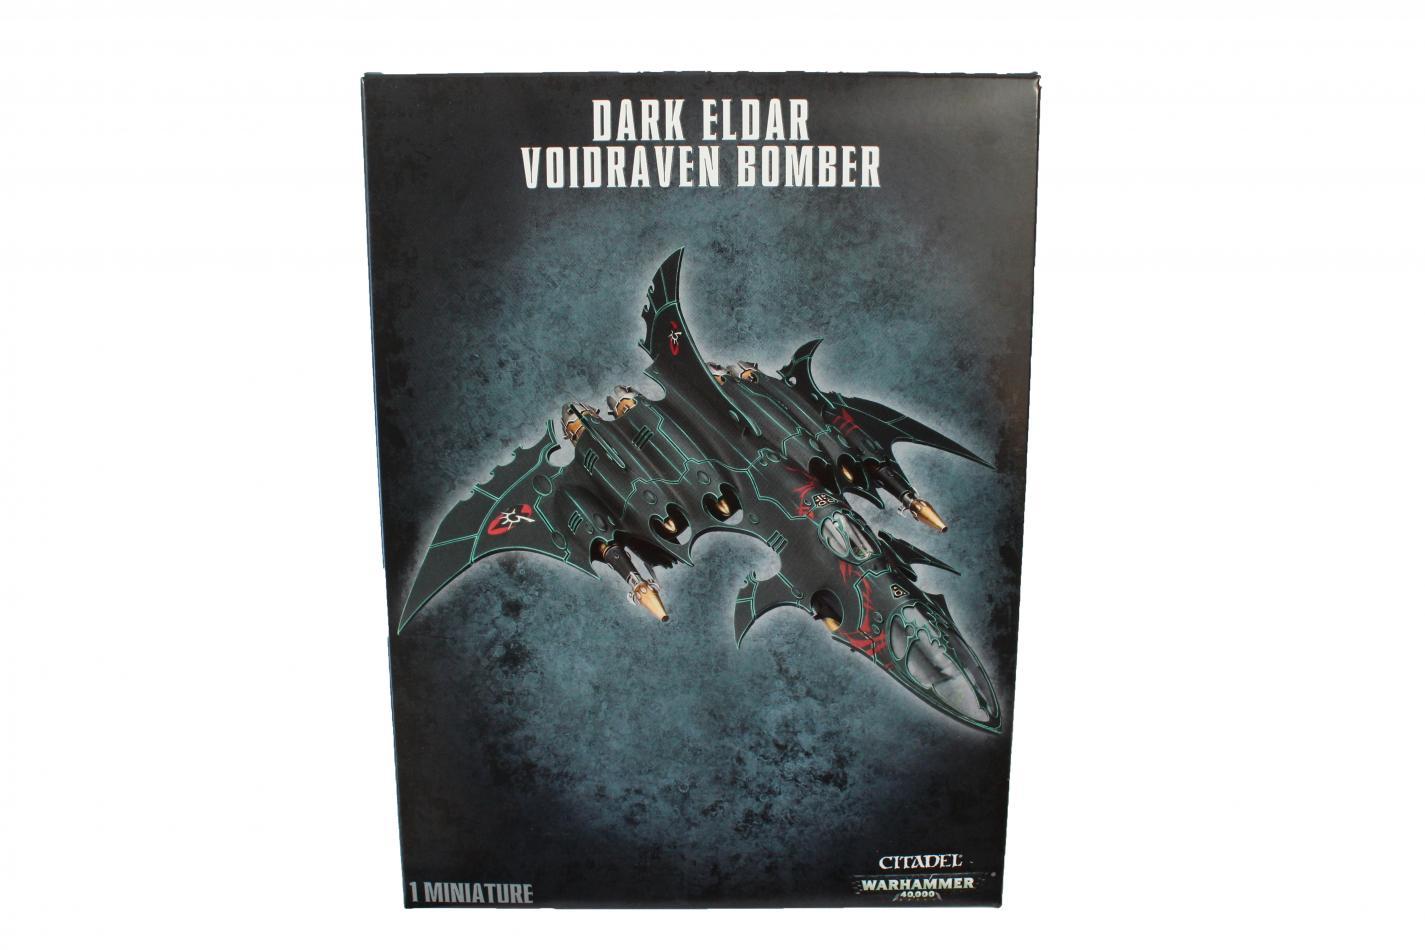 Dark Eldar Void Raven Bomber